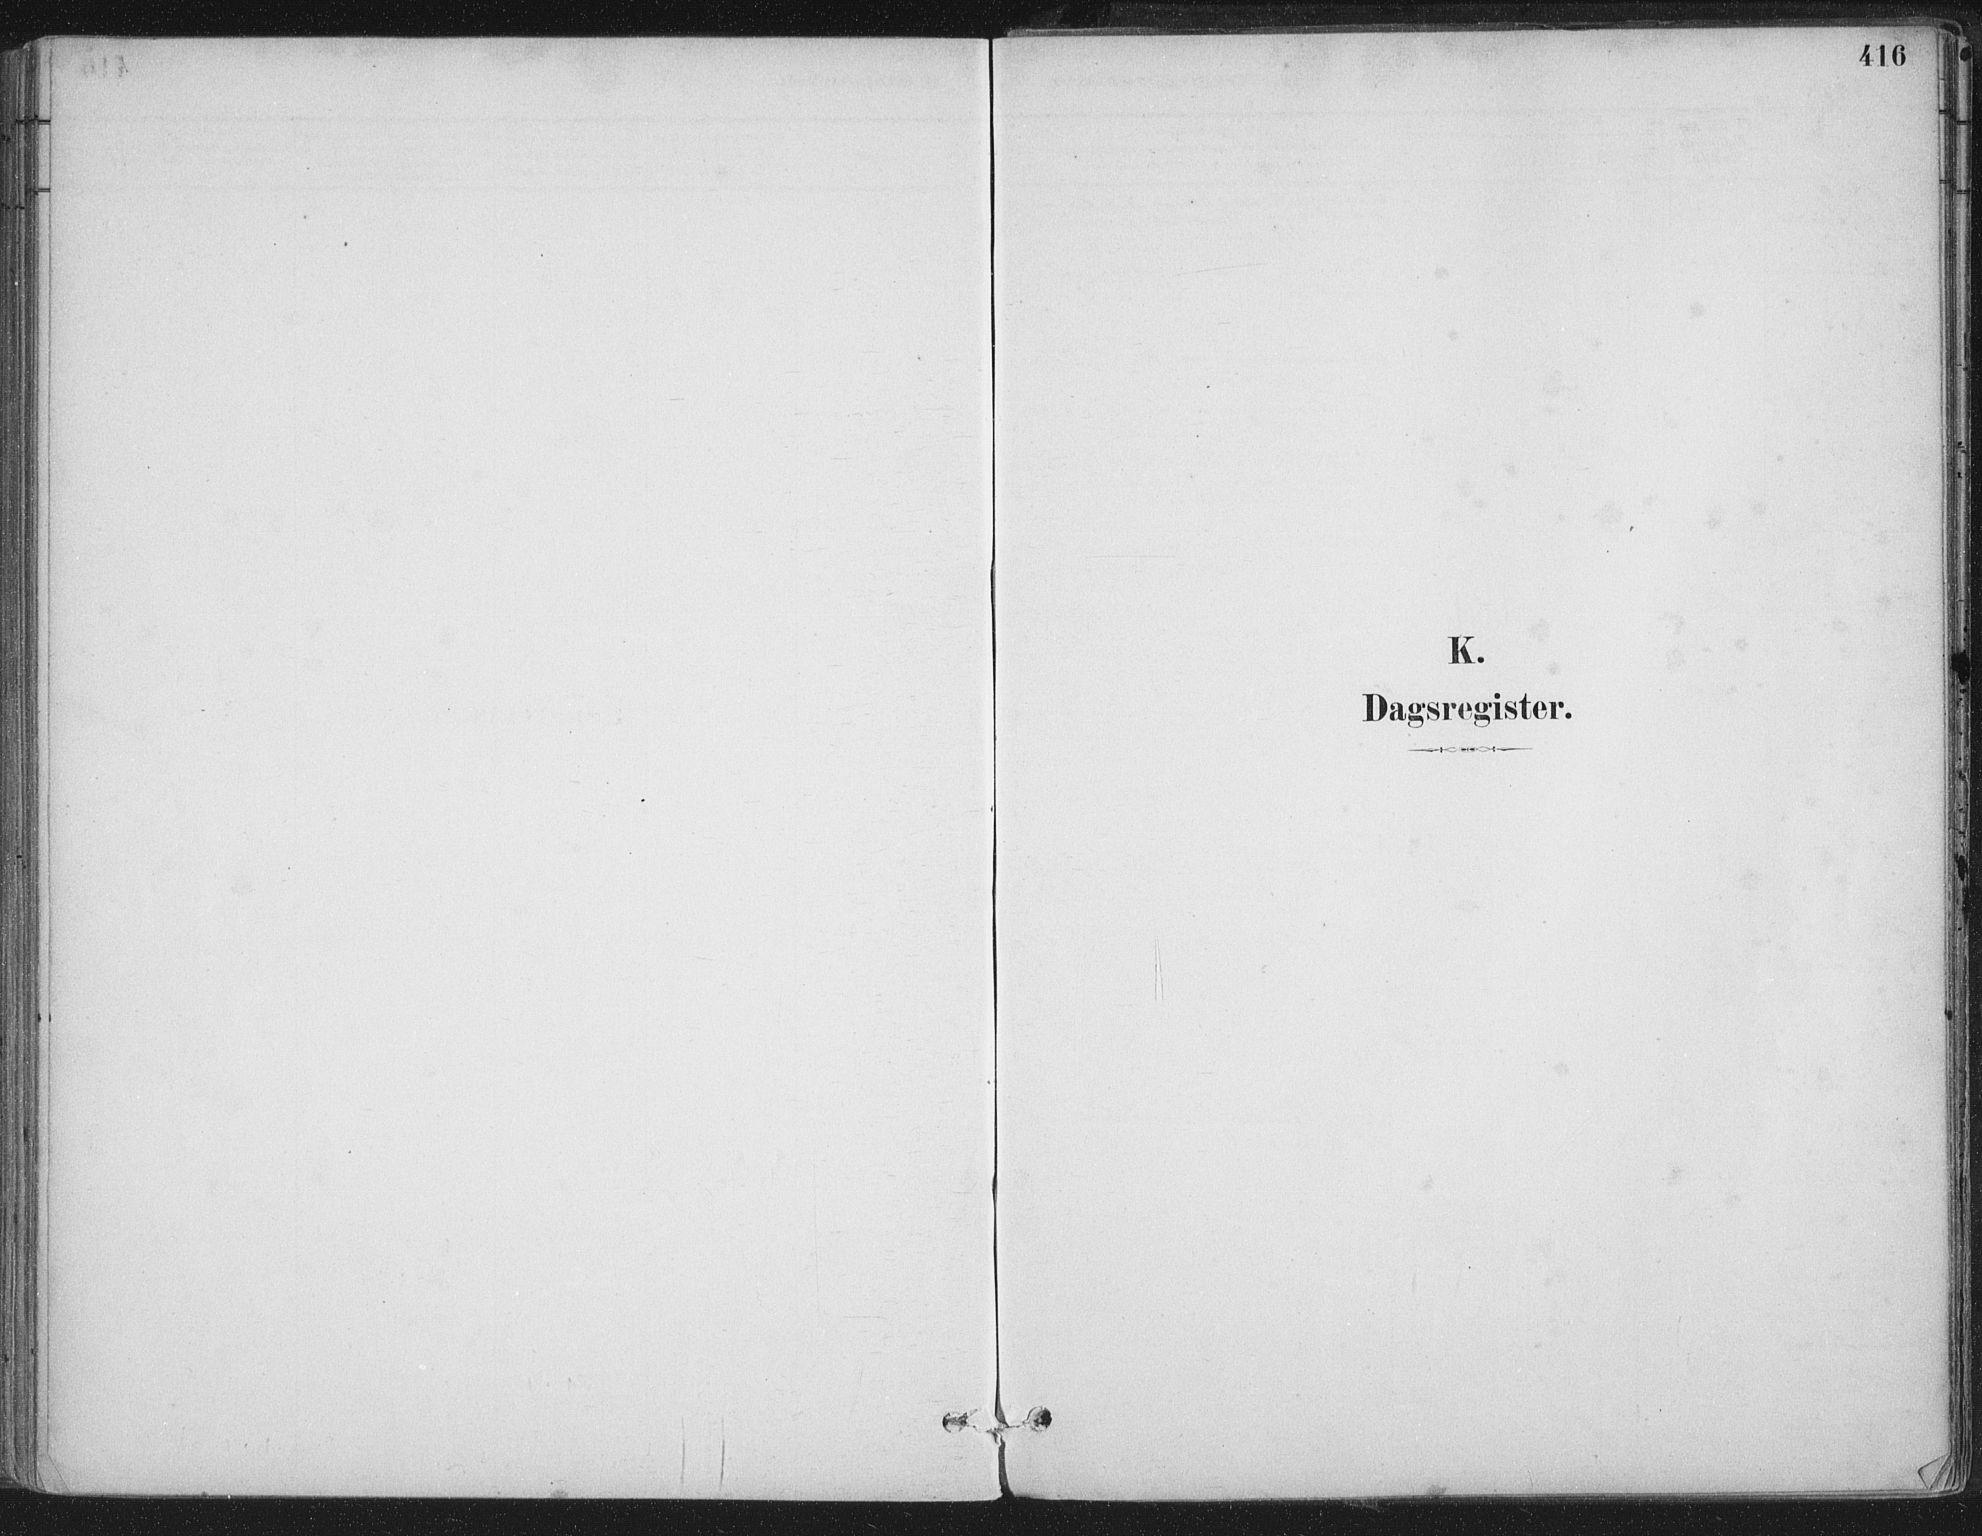 SAT, Ministerialprotokoller, klokkerbøker og fødselsregistre - Nordland, 888/L1244: Ministerialbok nr. 888A10, 1880-1890, s. 416